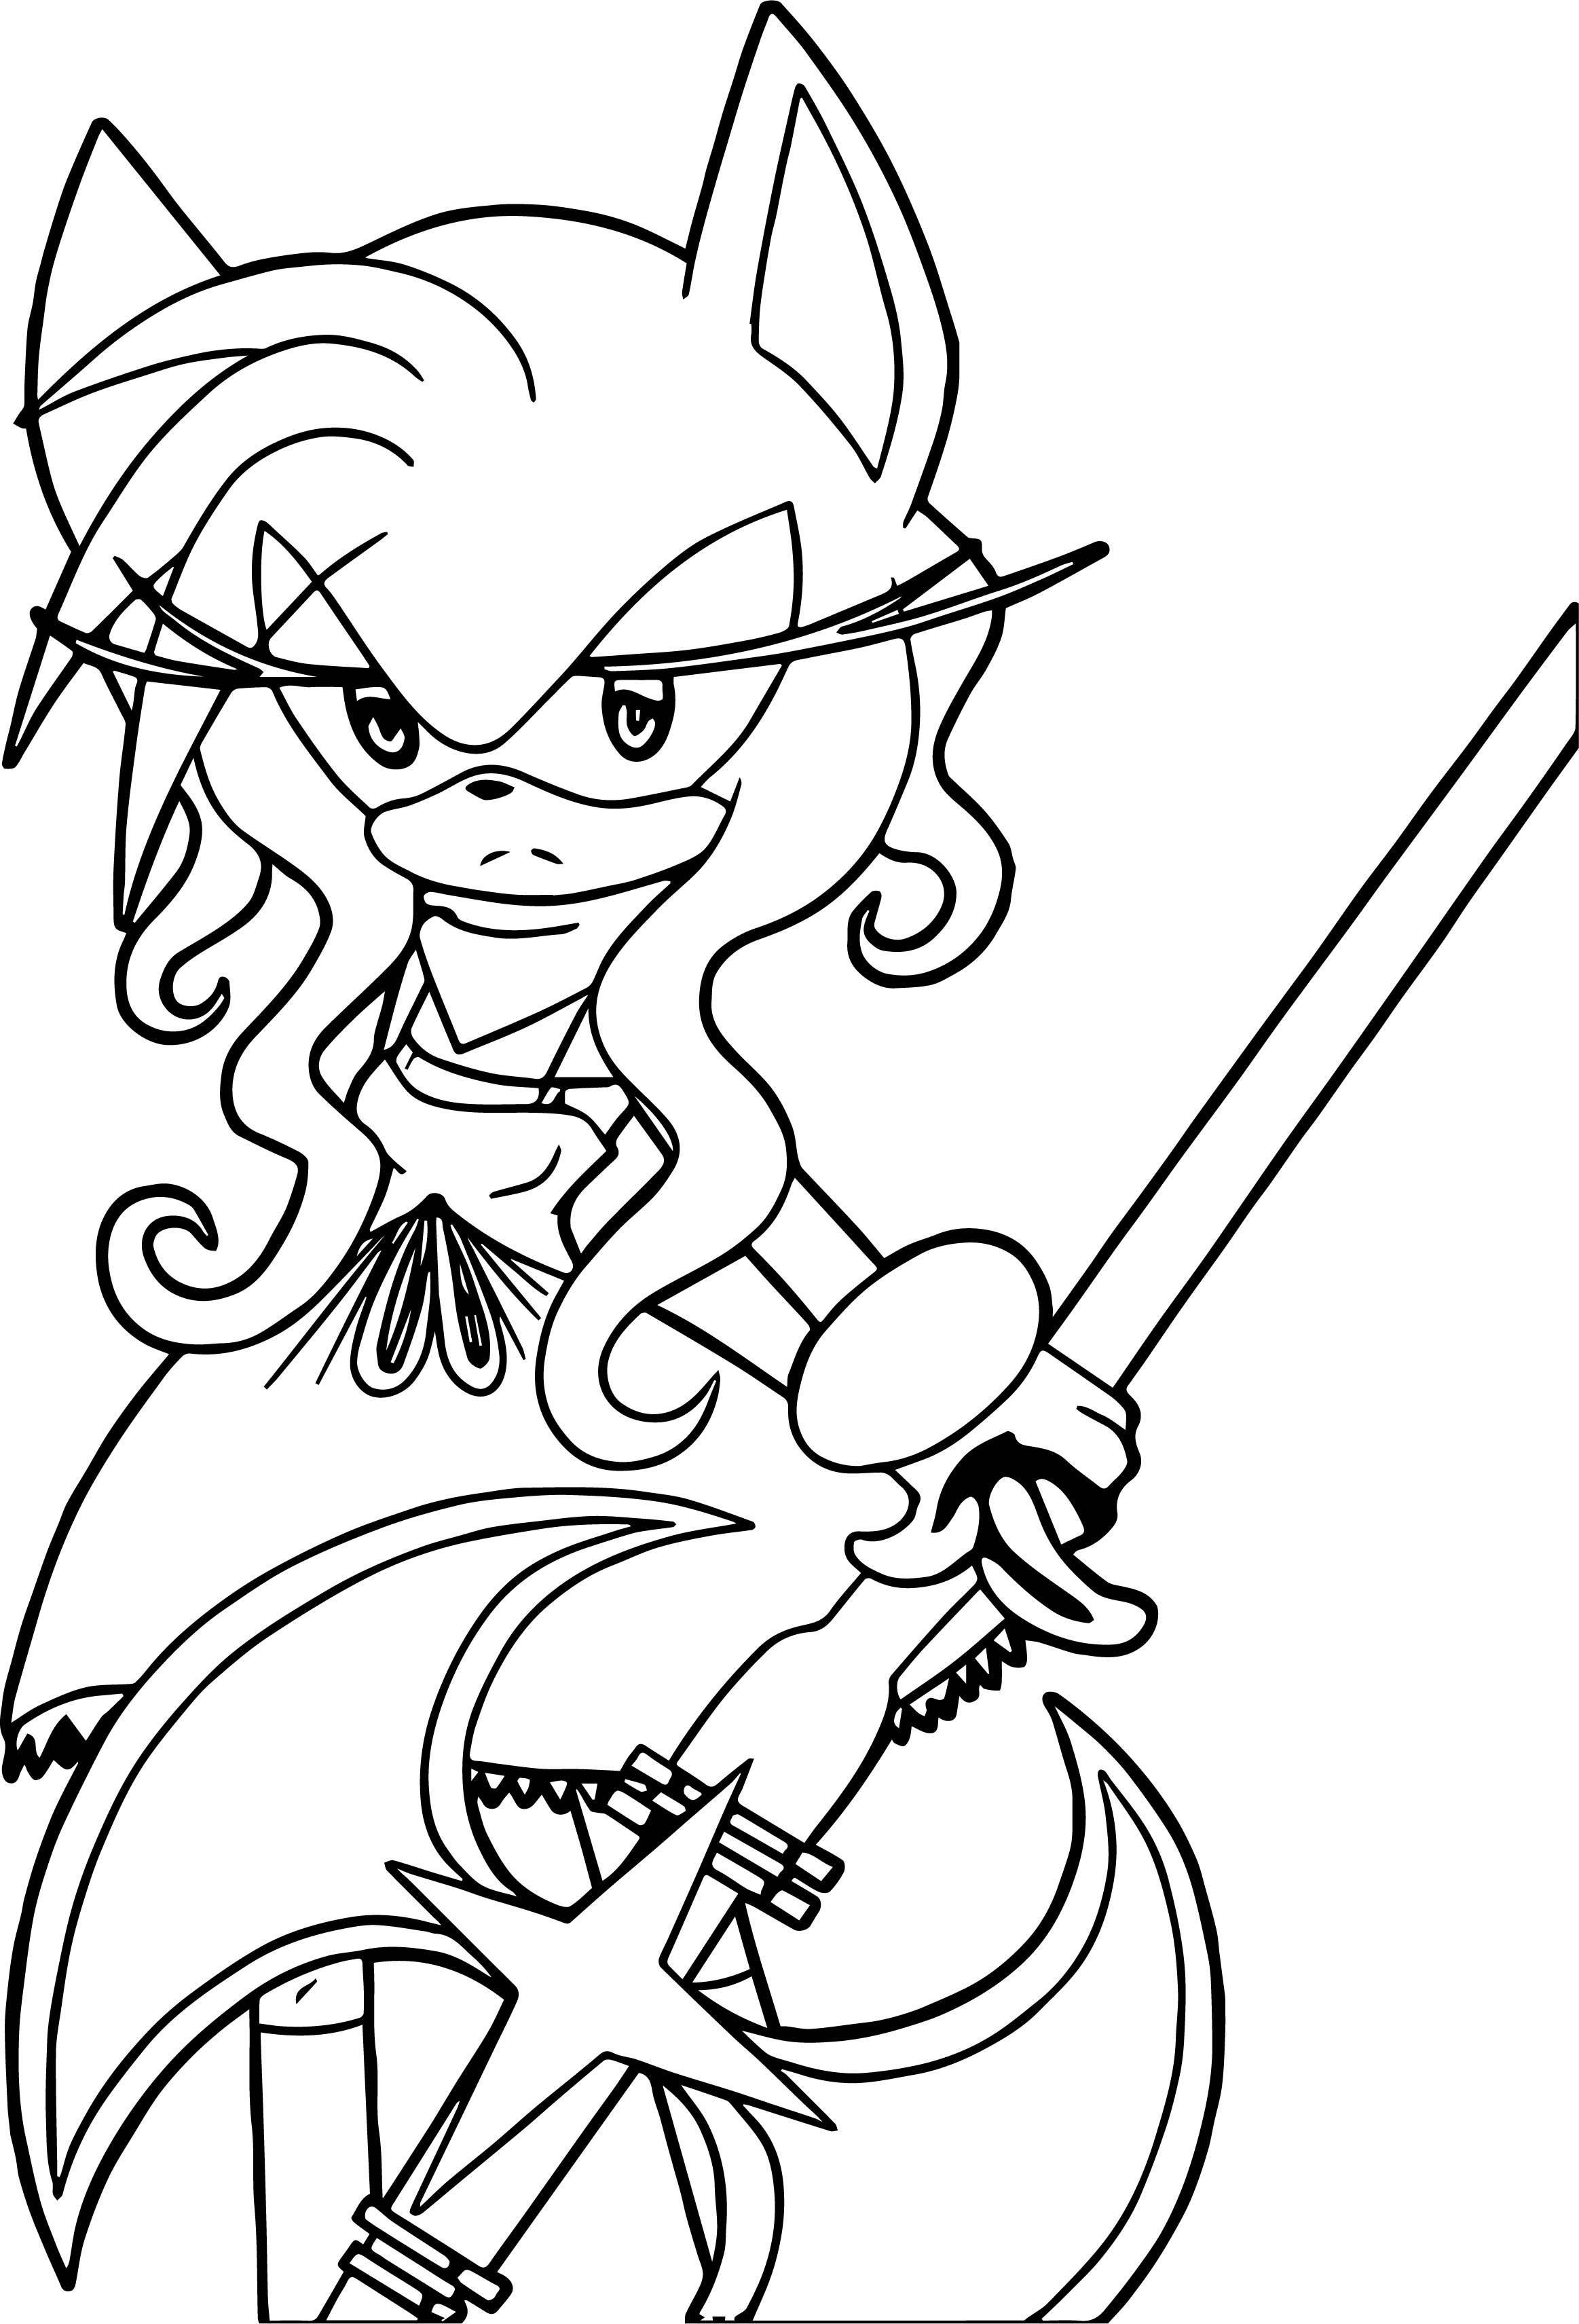 Amy Rose Samurai Coloring Page